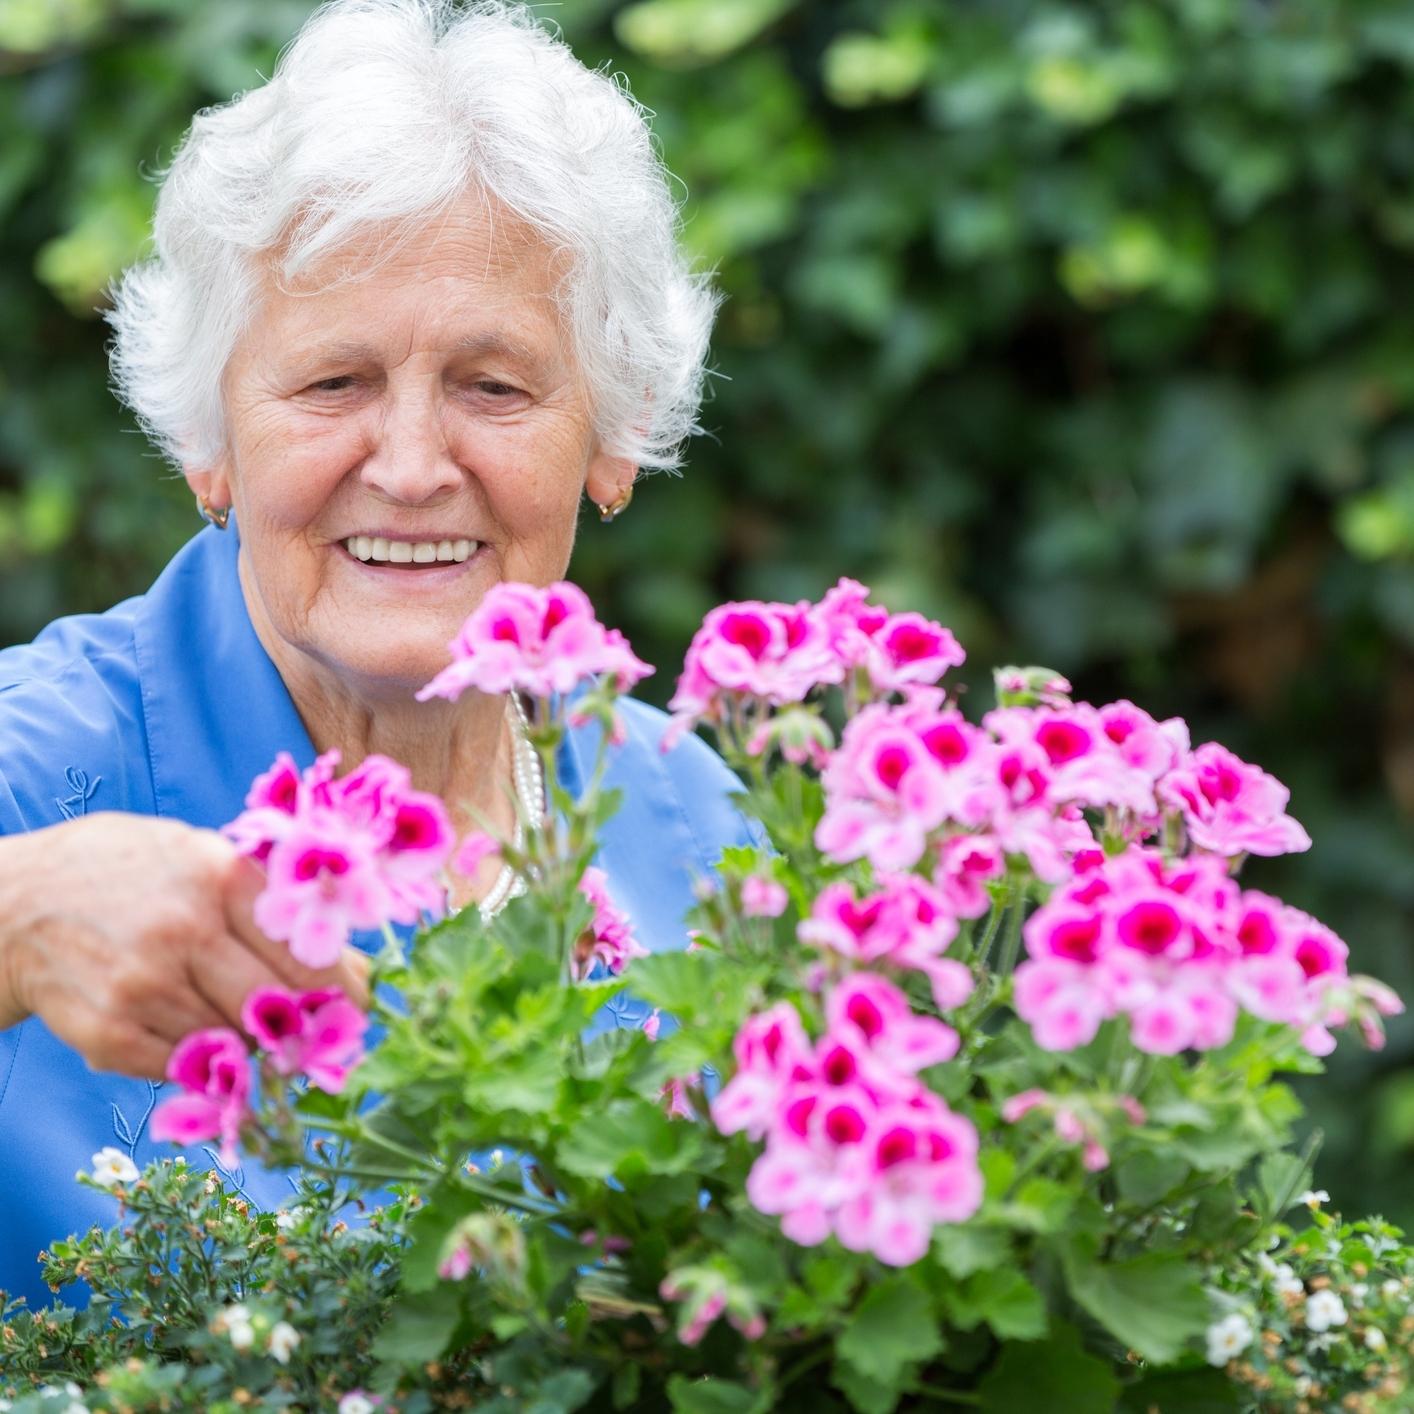 senior-woman-with-pink-flowers.jpg